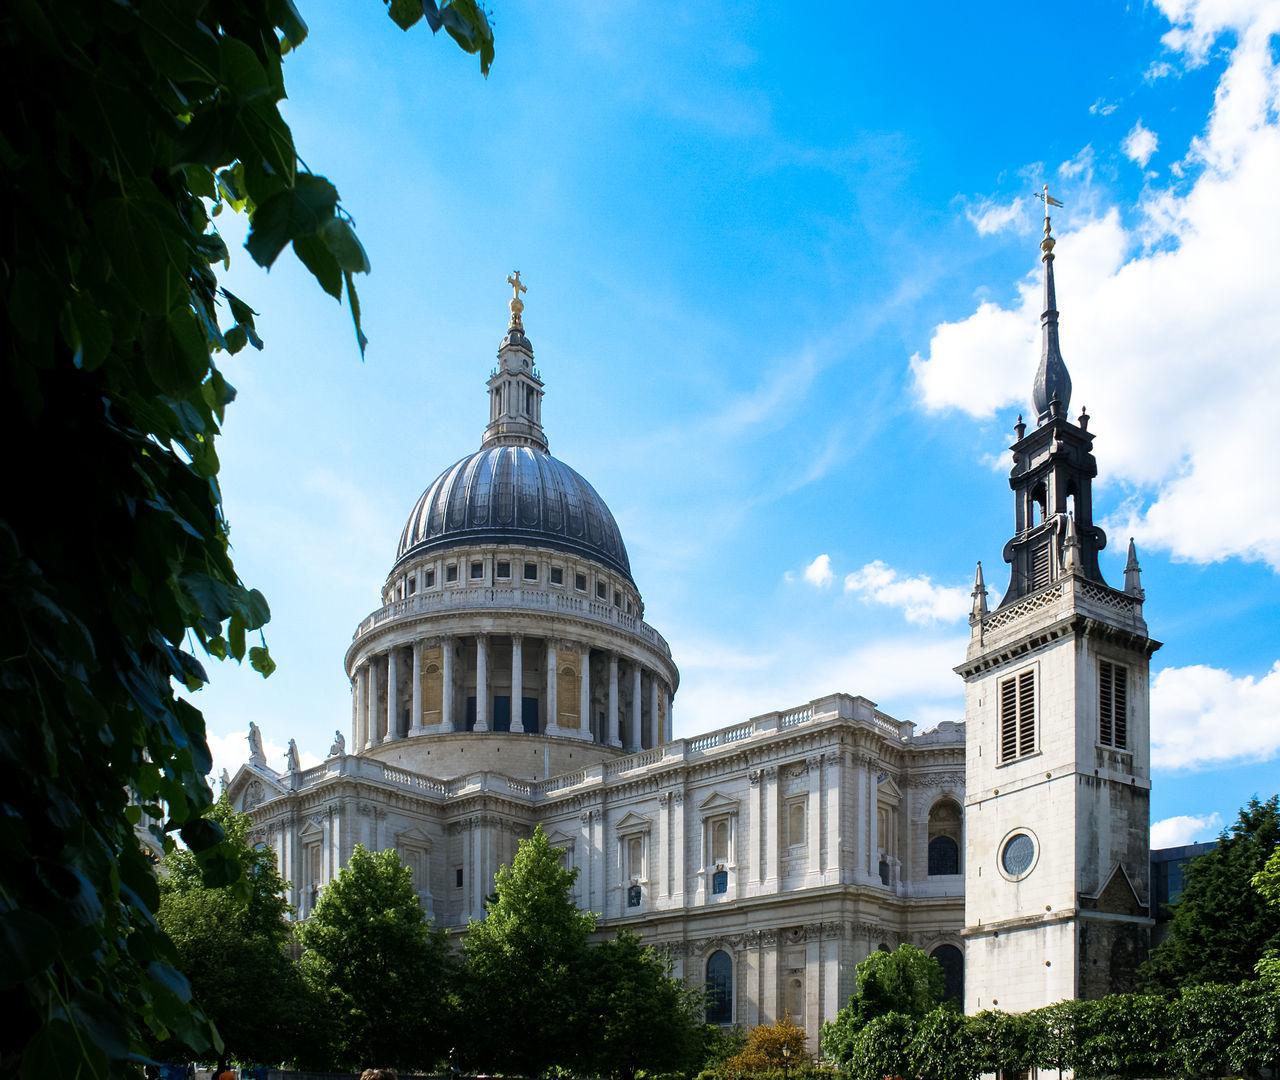 Architecture City EFENE Efene-studio Efene-studio.com London LONDON❤ St-Paul's The Architect - 2016 EyeEm Awards The Architect- 2016 Eyeem Awards